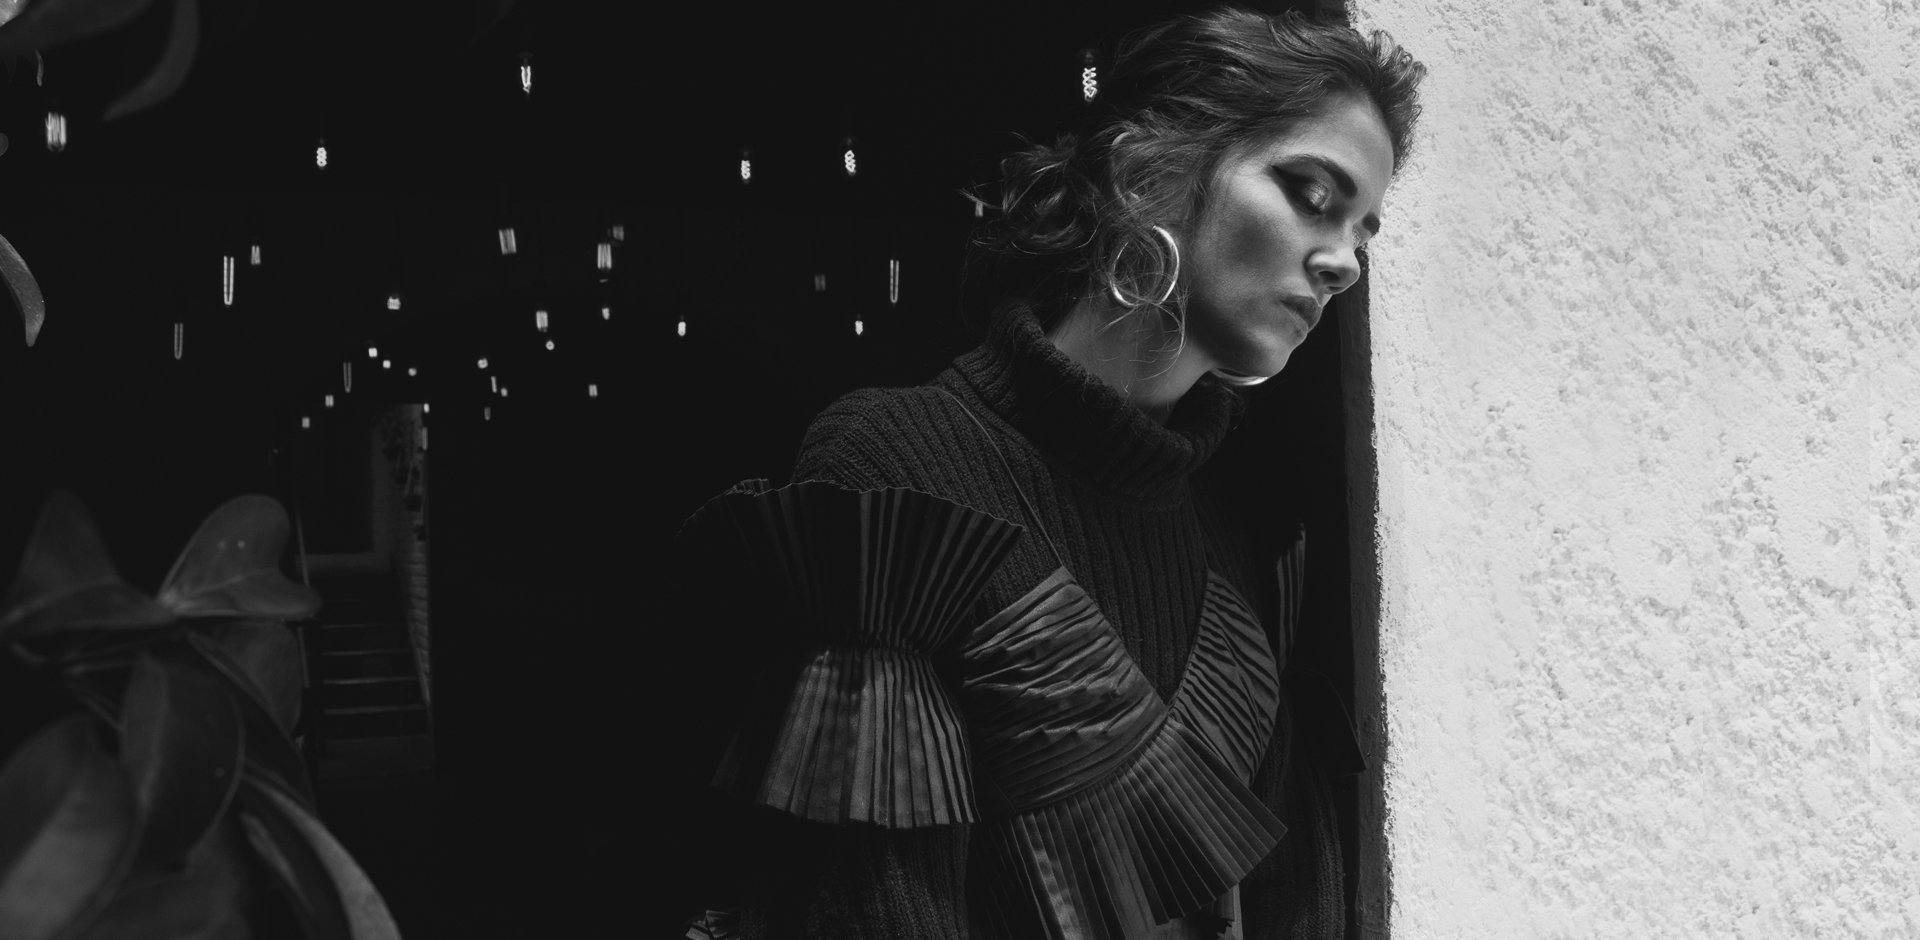 nicolas-luna-photographer